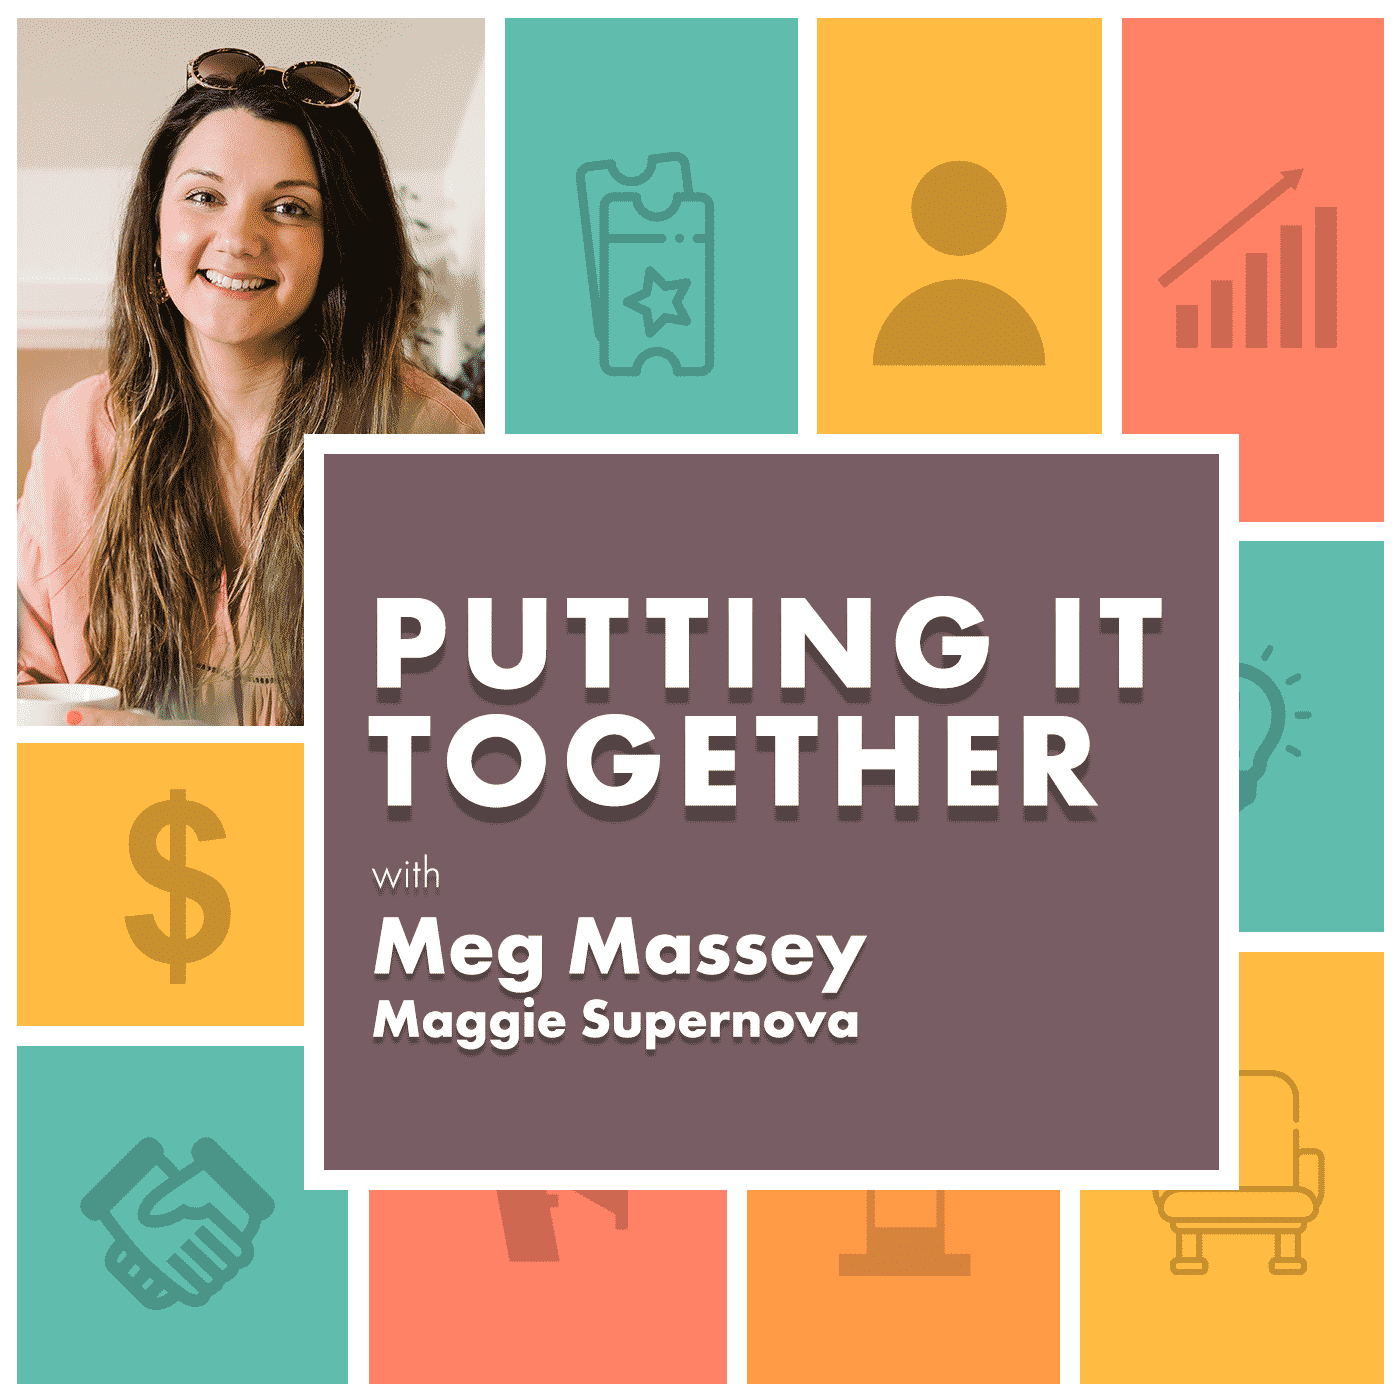 Meg Massey, Maggie Supernova